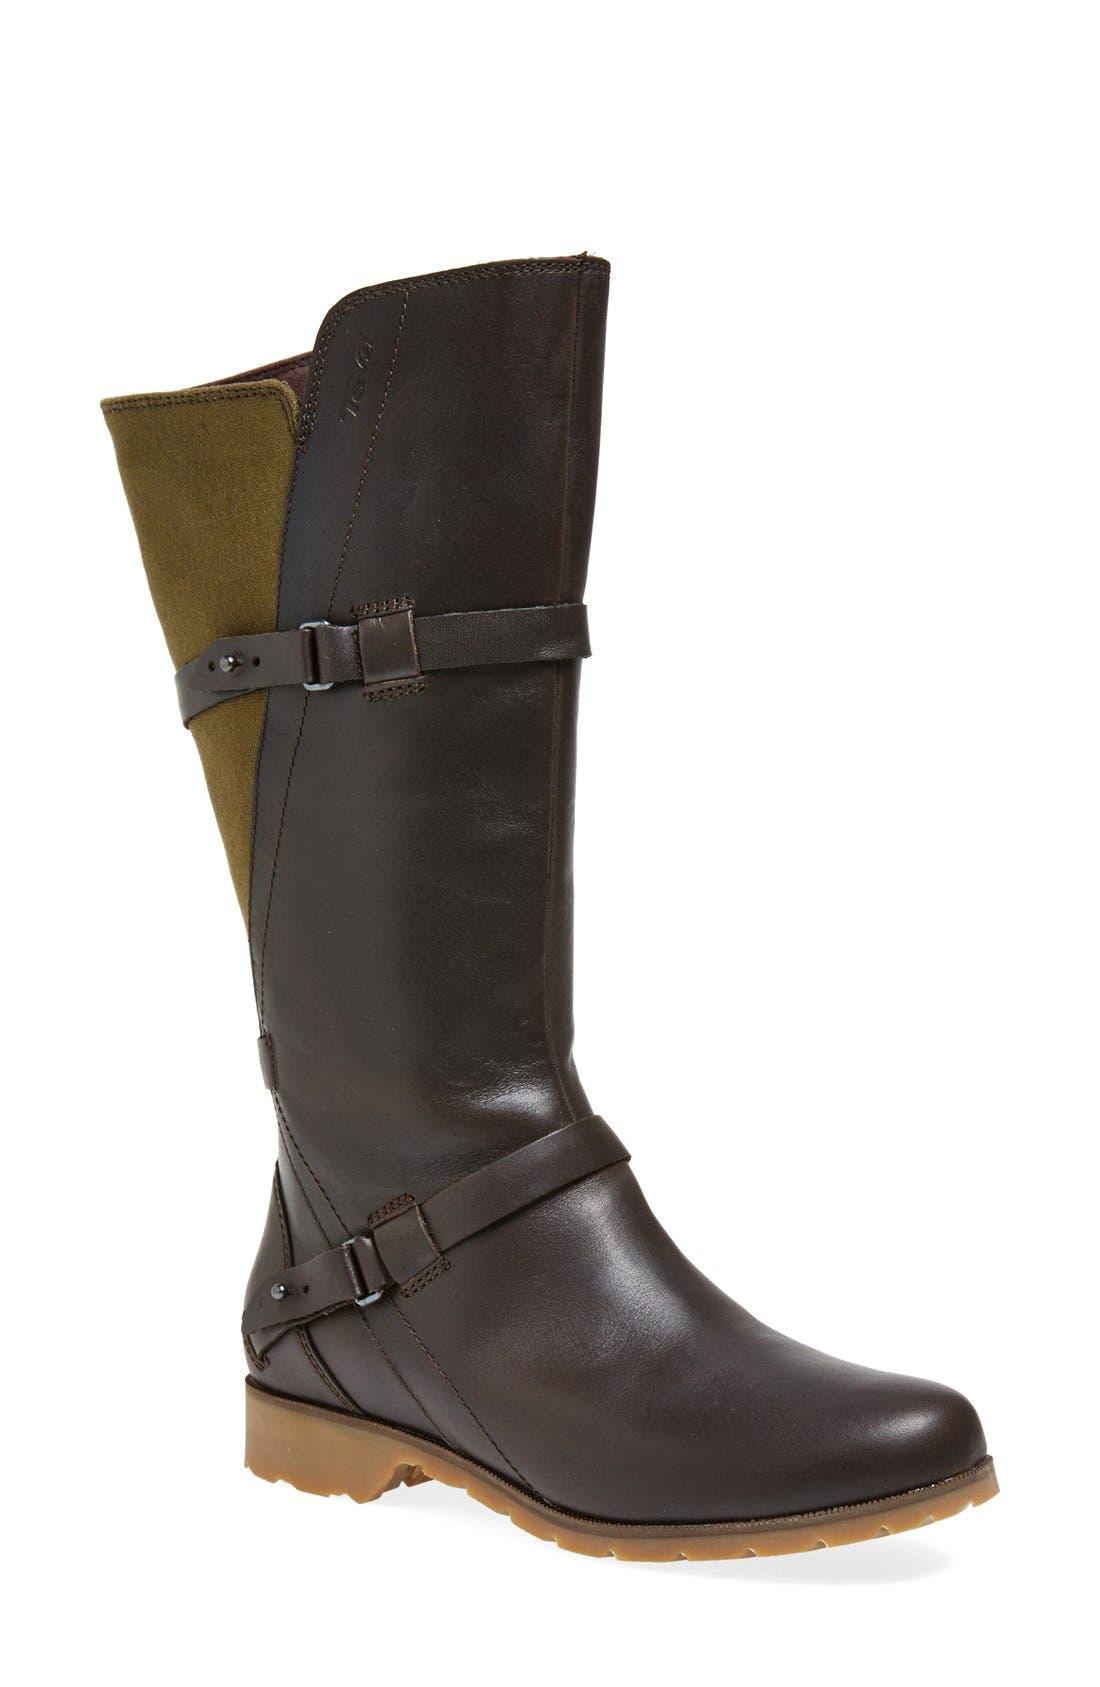 Alternate Image 1 Selected - Teva 'De La Vina' Boot (Women)